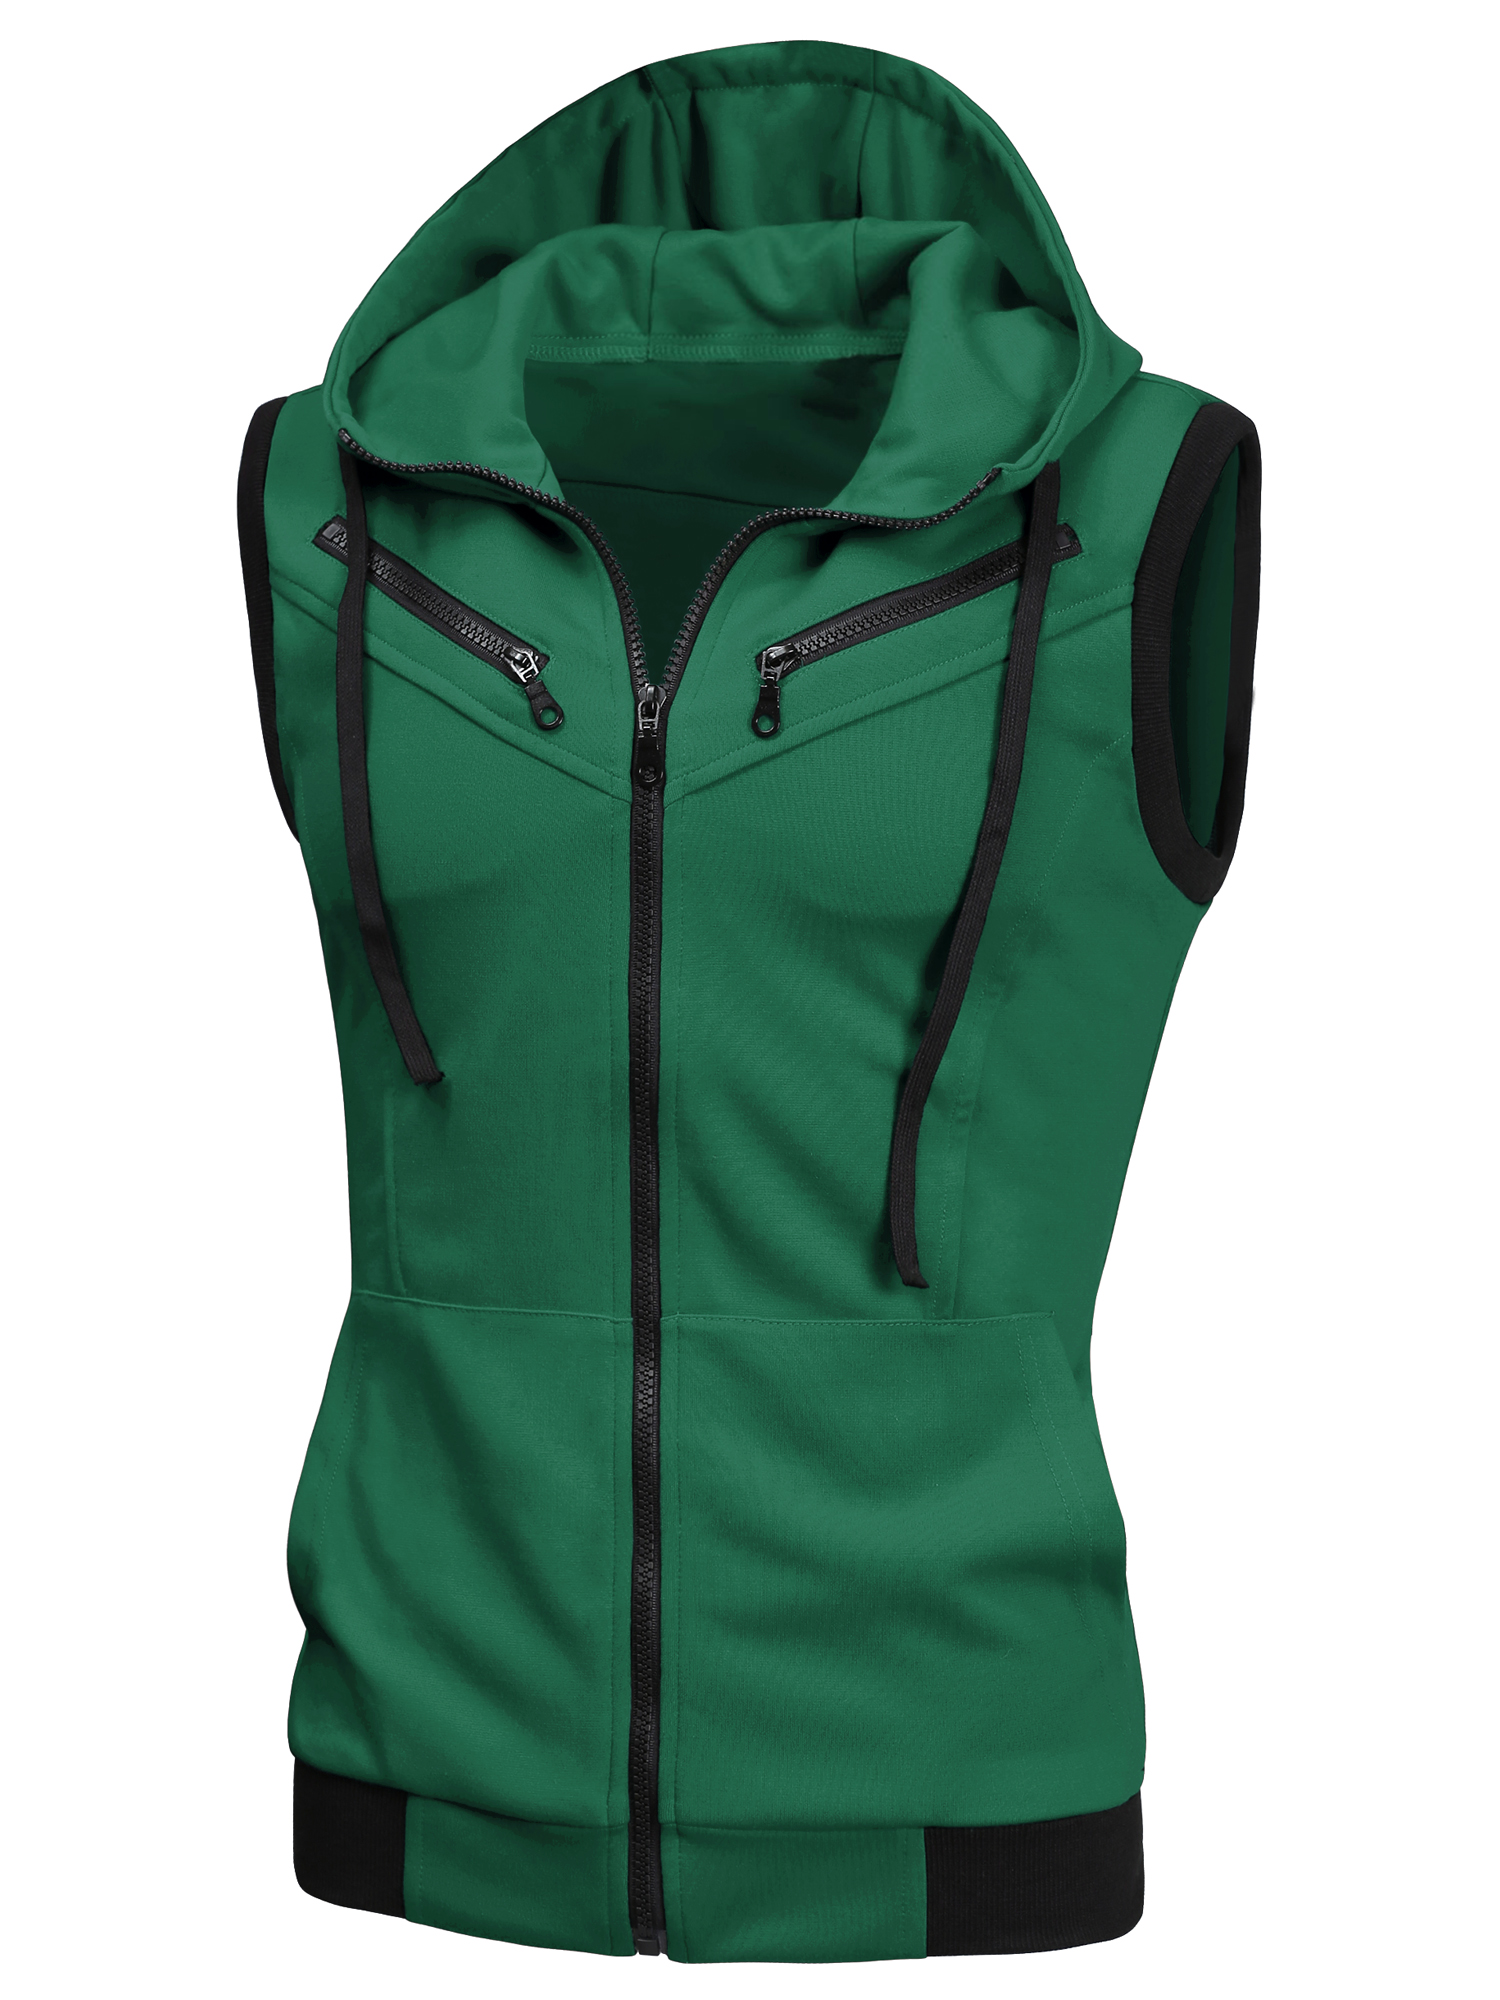 Men Zip Up Front Pockets Detail Ribbing Hem Leisure Hoody Vest Green M